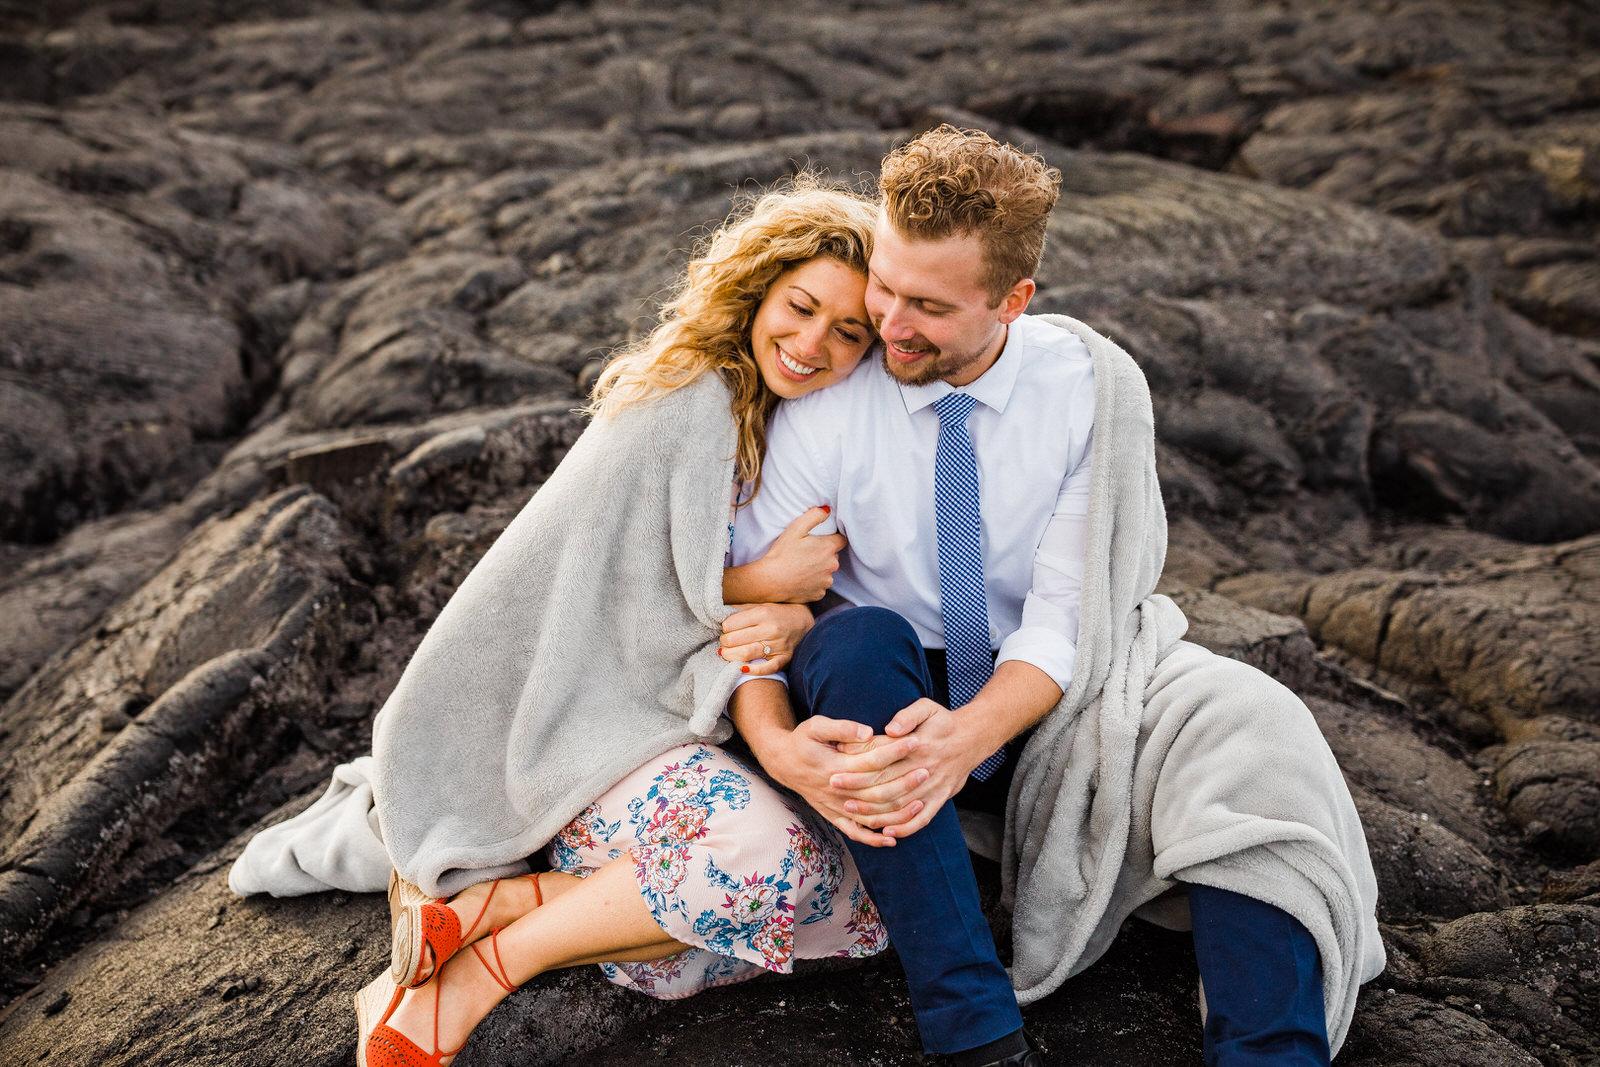 engagements-hilo-happy-couple-big-island-hawaii-9.jpg